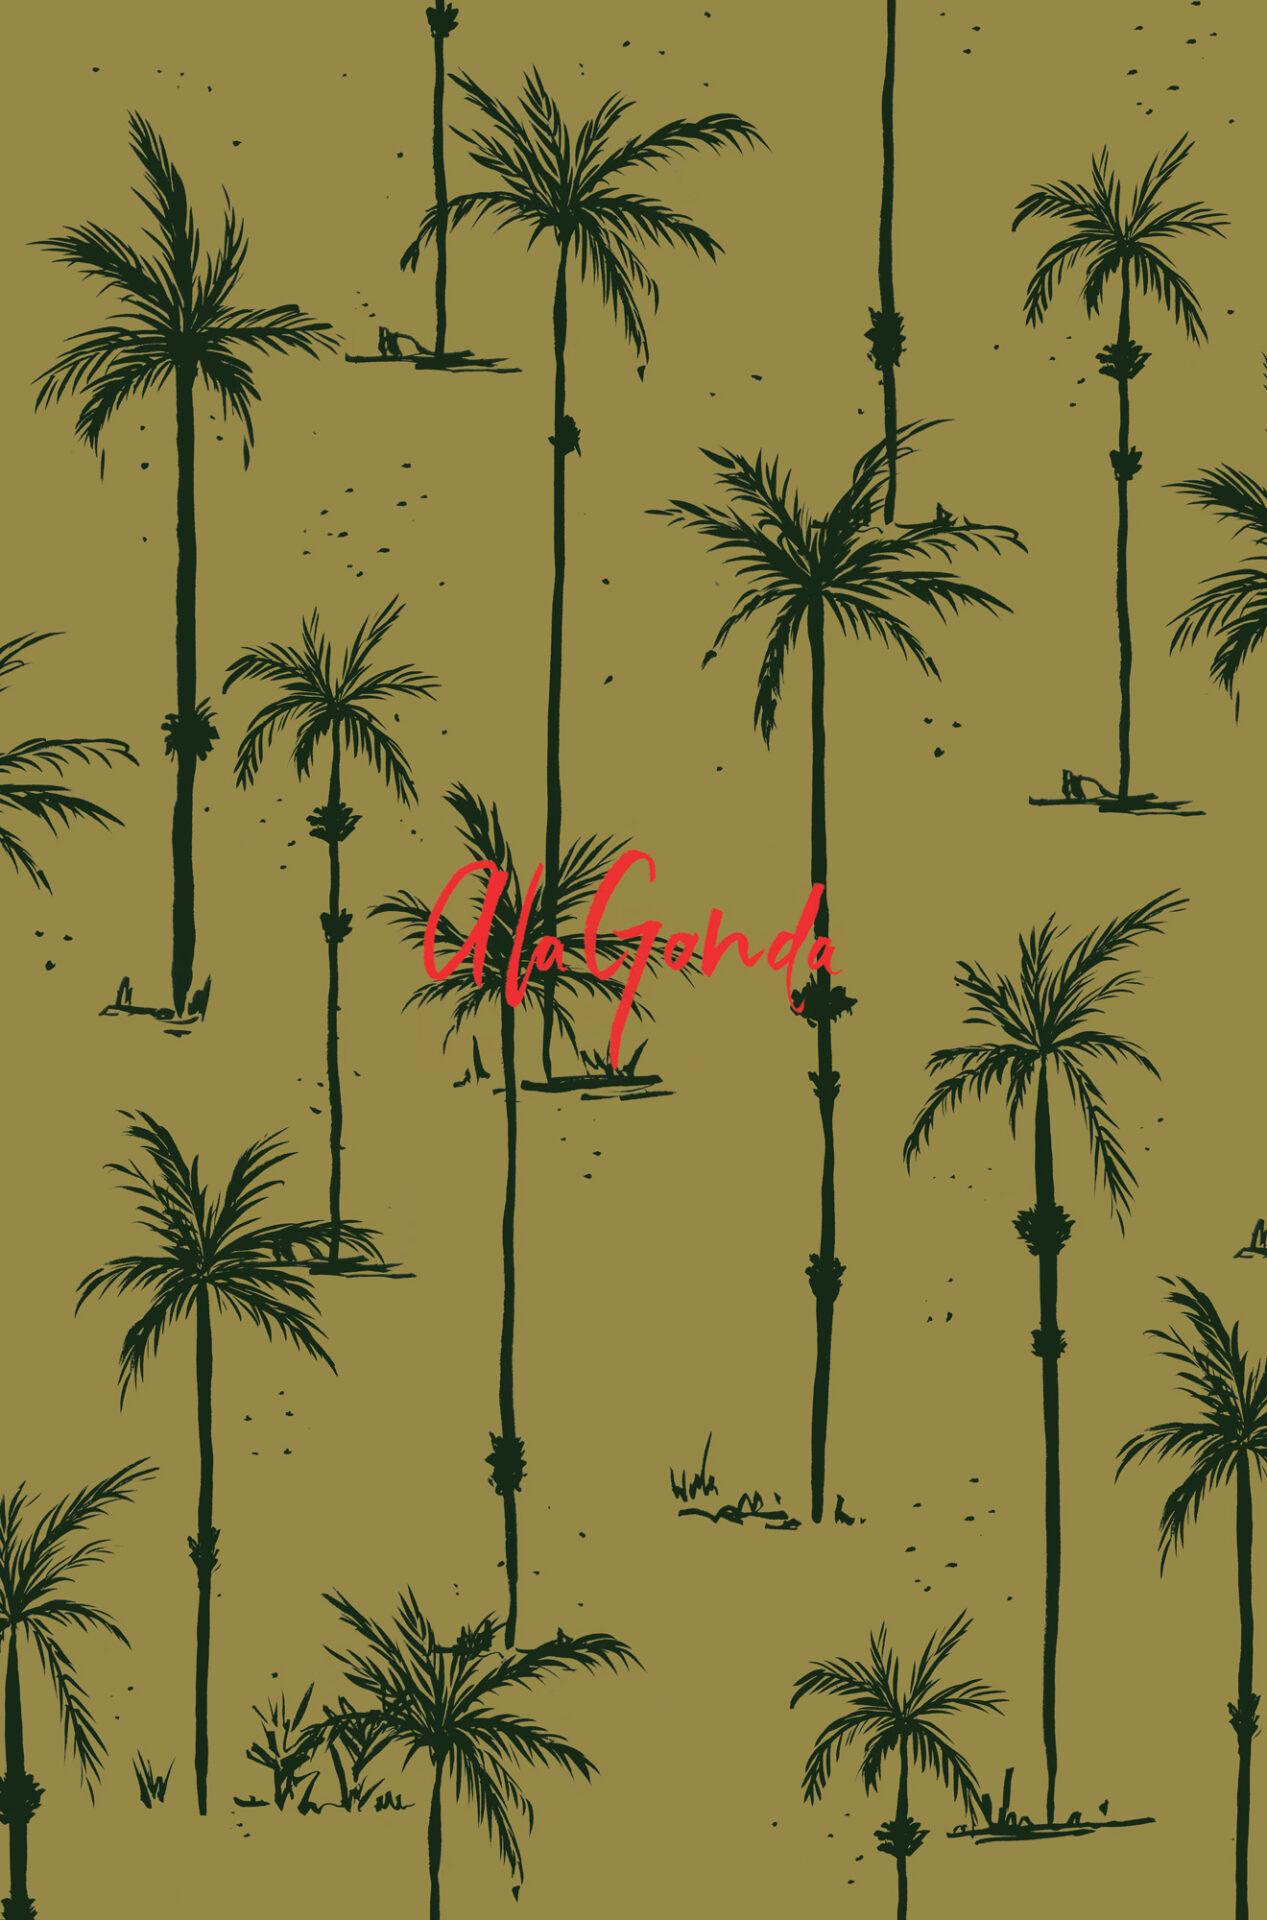 alagonda-salento-palmtrees-oker-green